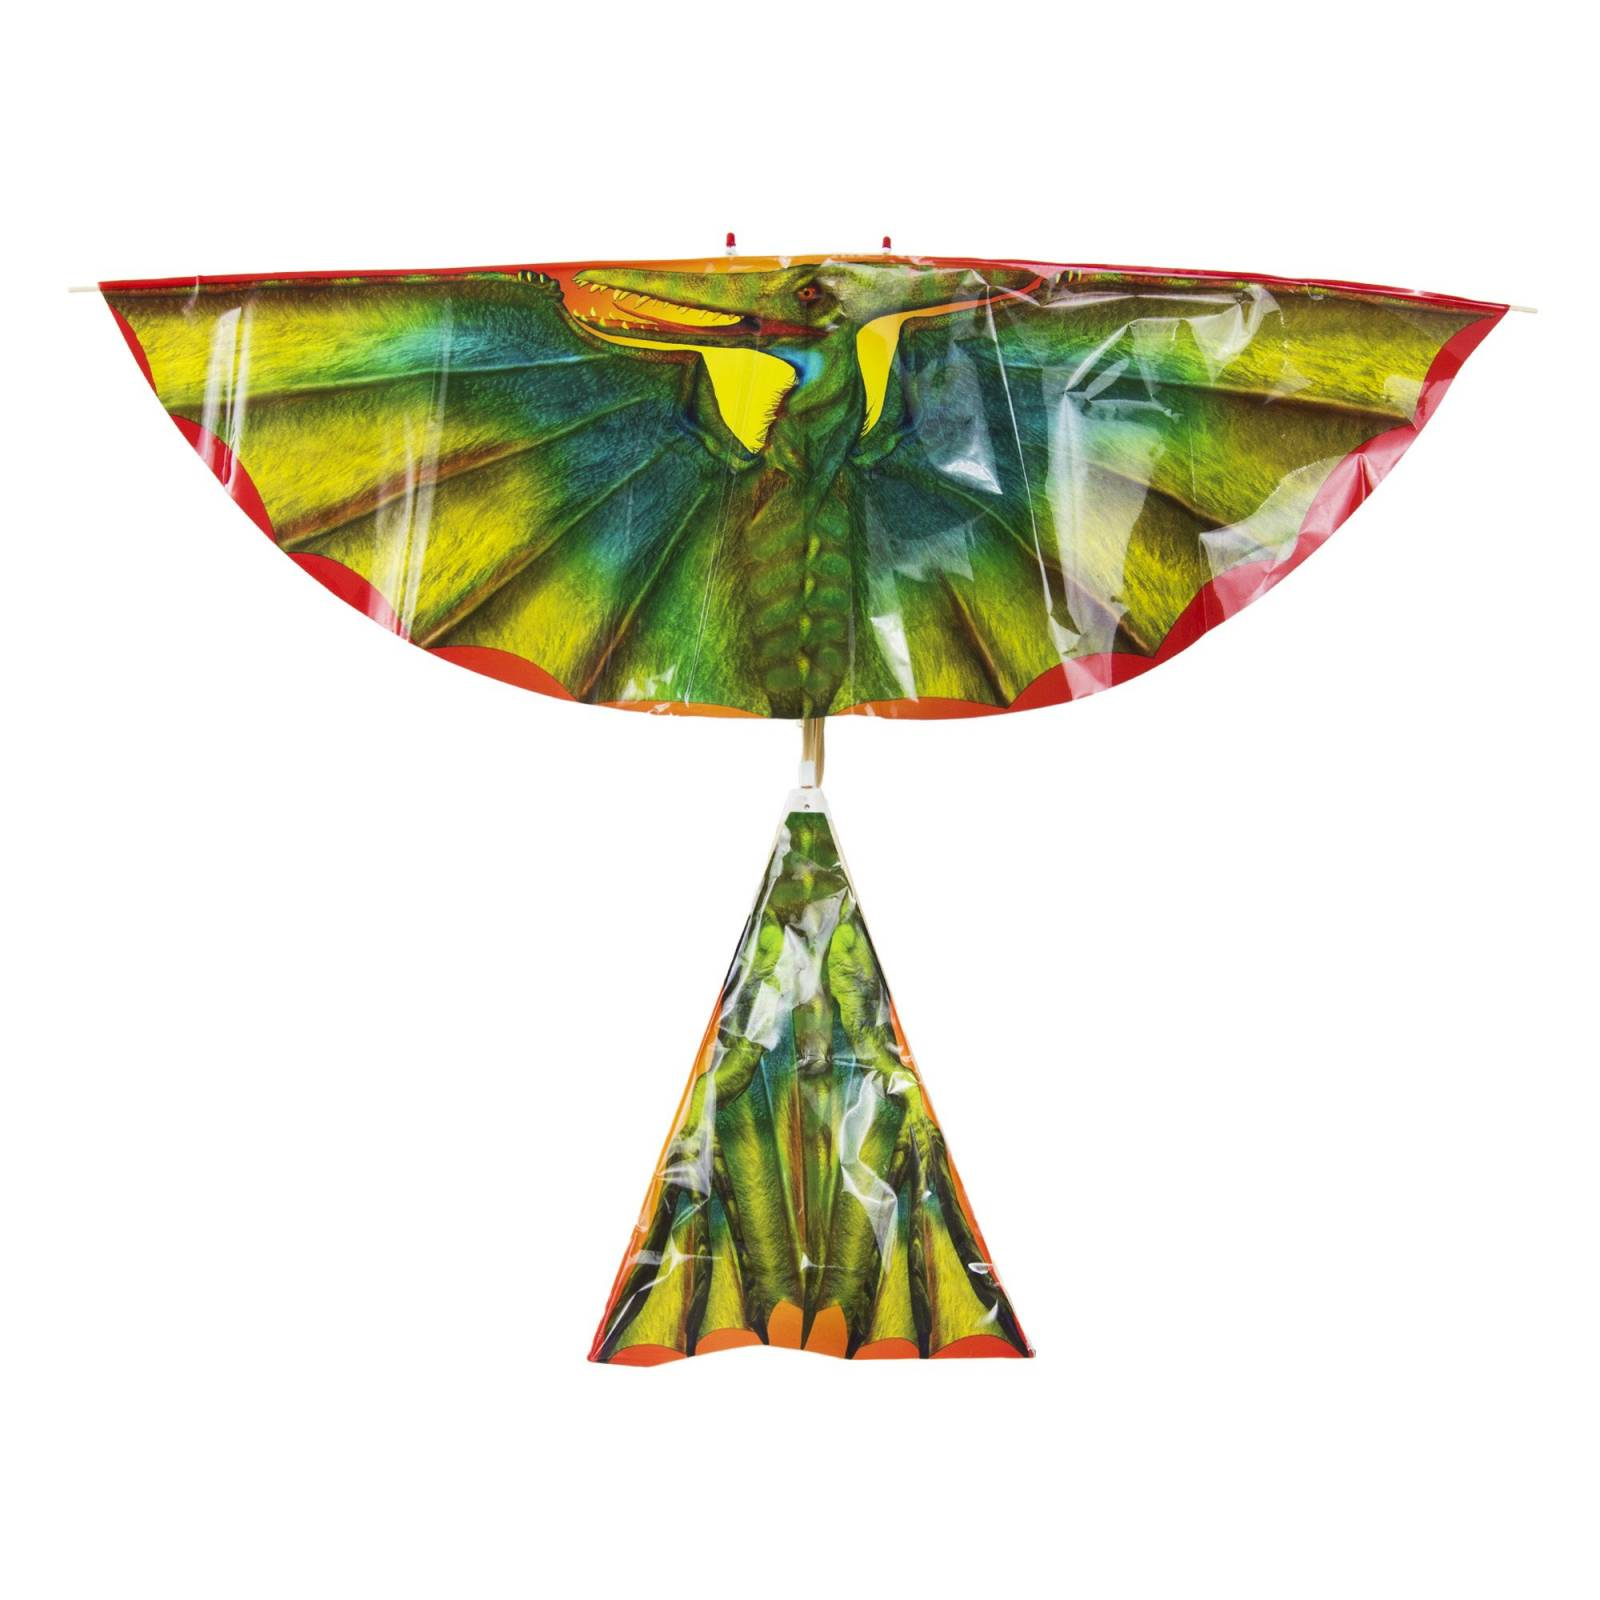 Pterodactyl Flying Machine 8yr+ thumbnails